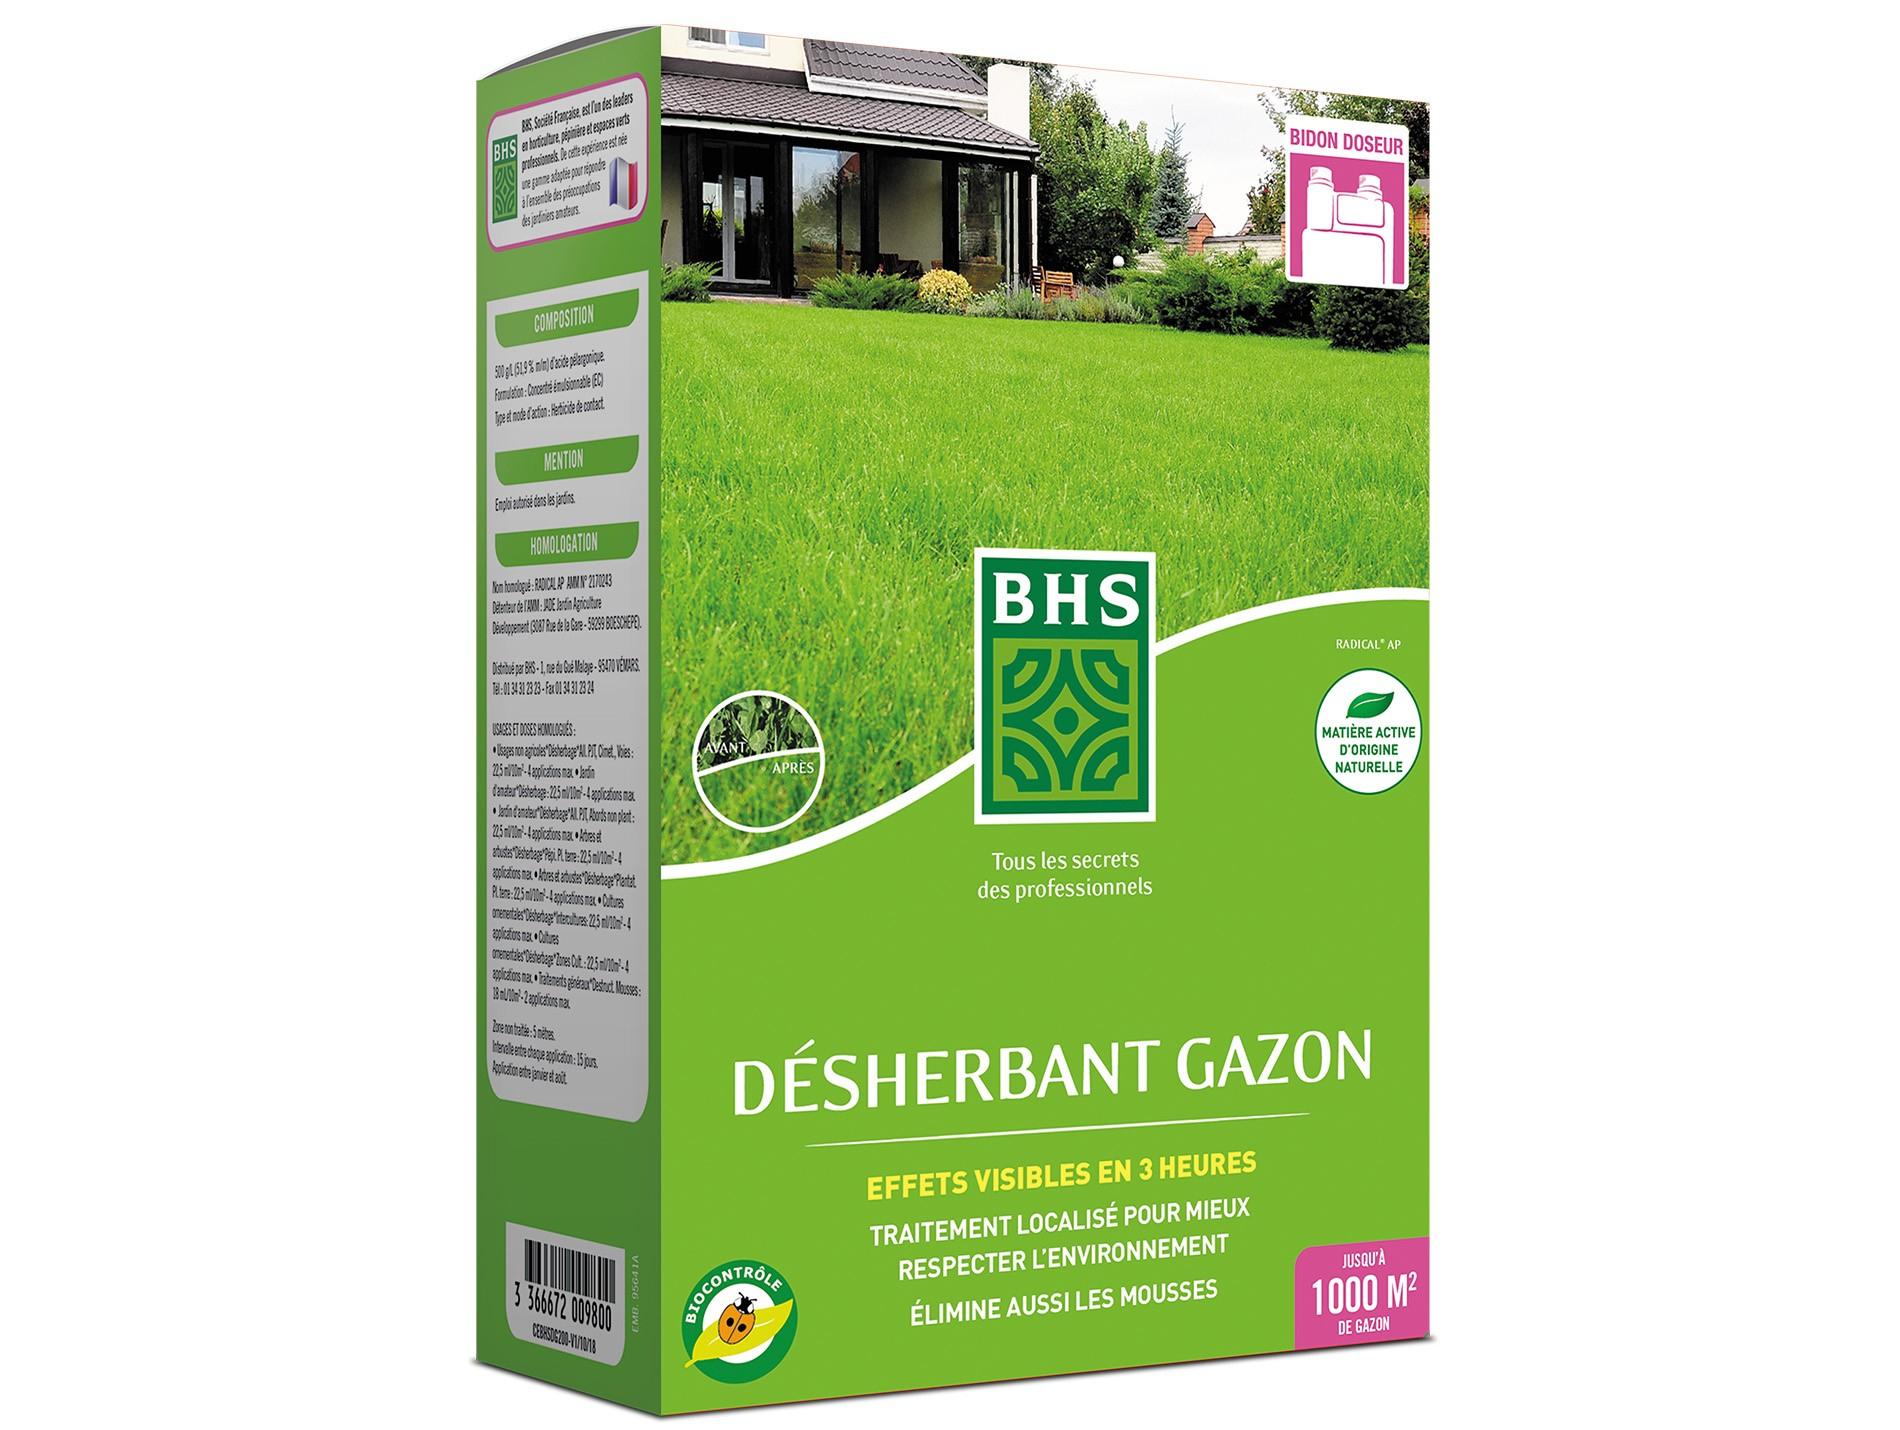 Désherbant Gazon 400Ml Bhs - Désherbant, Anti-Dépôts Verts ... avec Bayer Jardin Desherbant Gazon